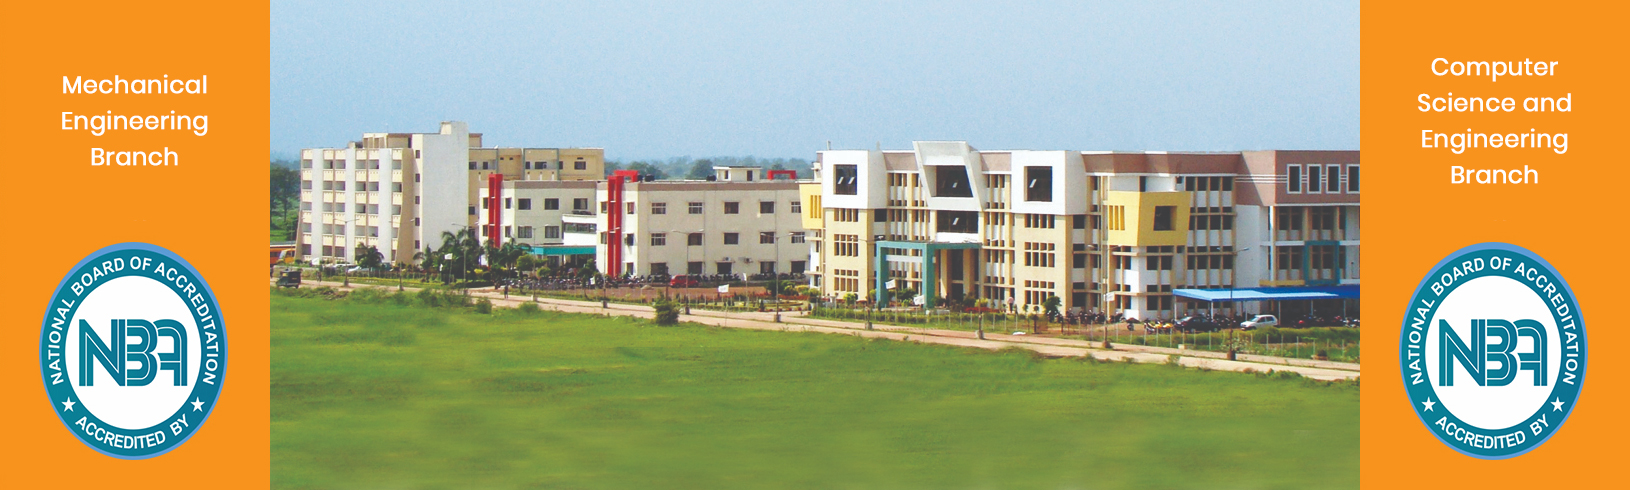 Shri Shankaracharya Institute Of Professional Management And Technology